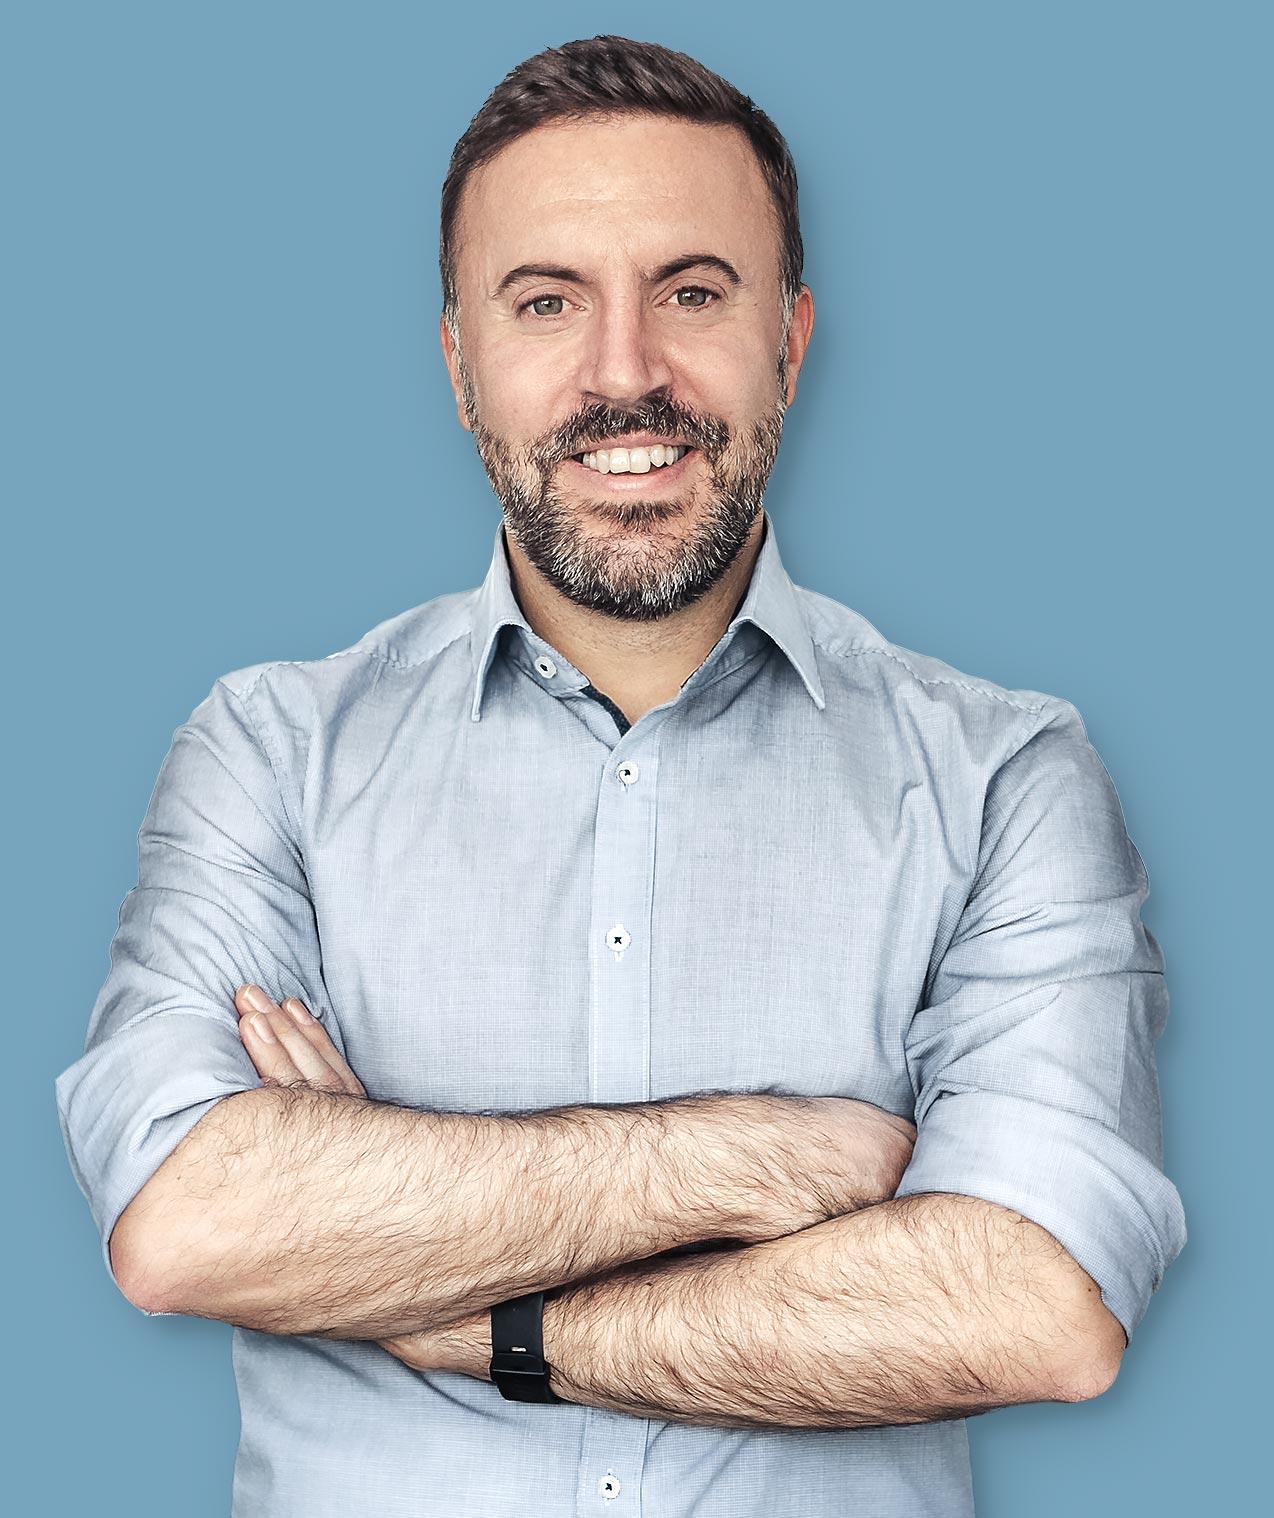 Derek Callan Online Lessons for Business English